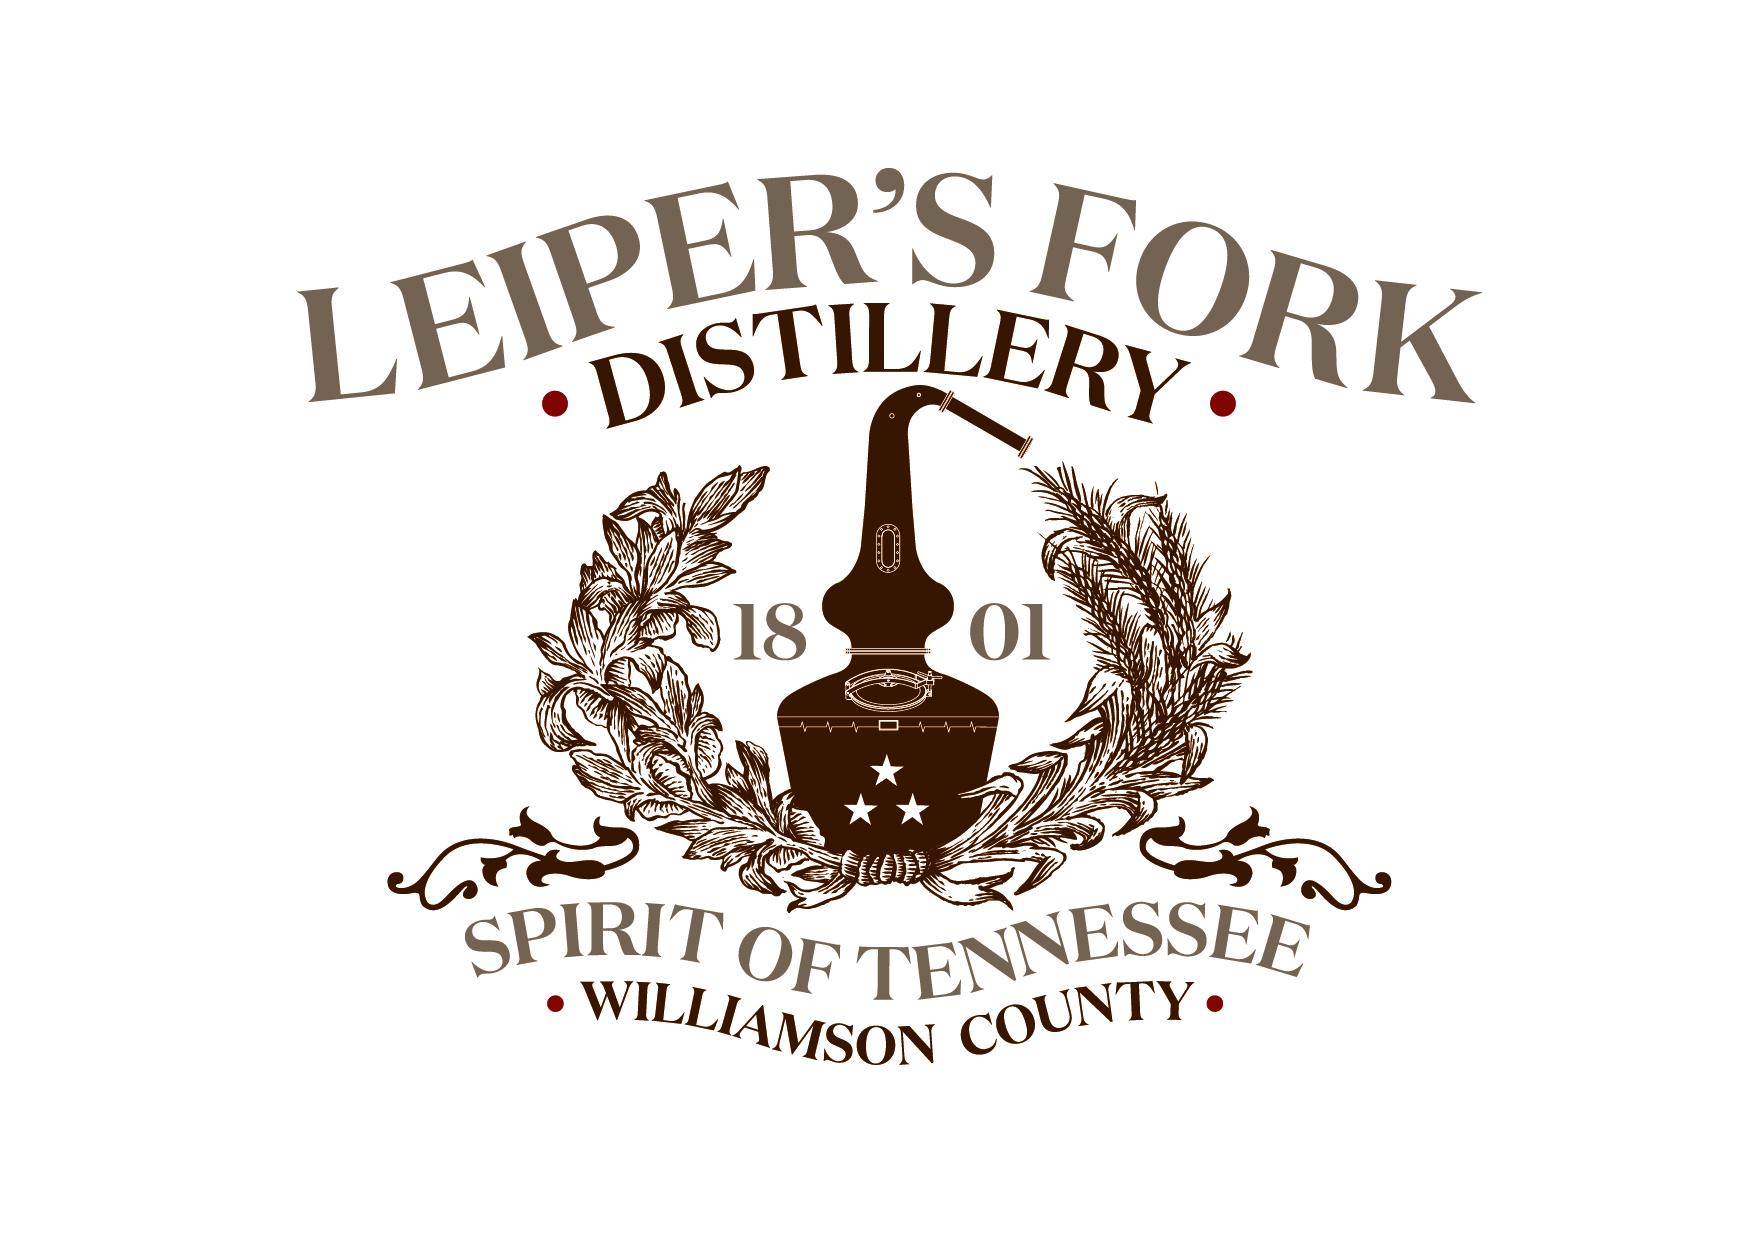 LEIPERS_FORK_MAIN_LOGO-simpstars-01.jpg